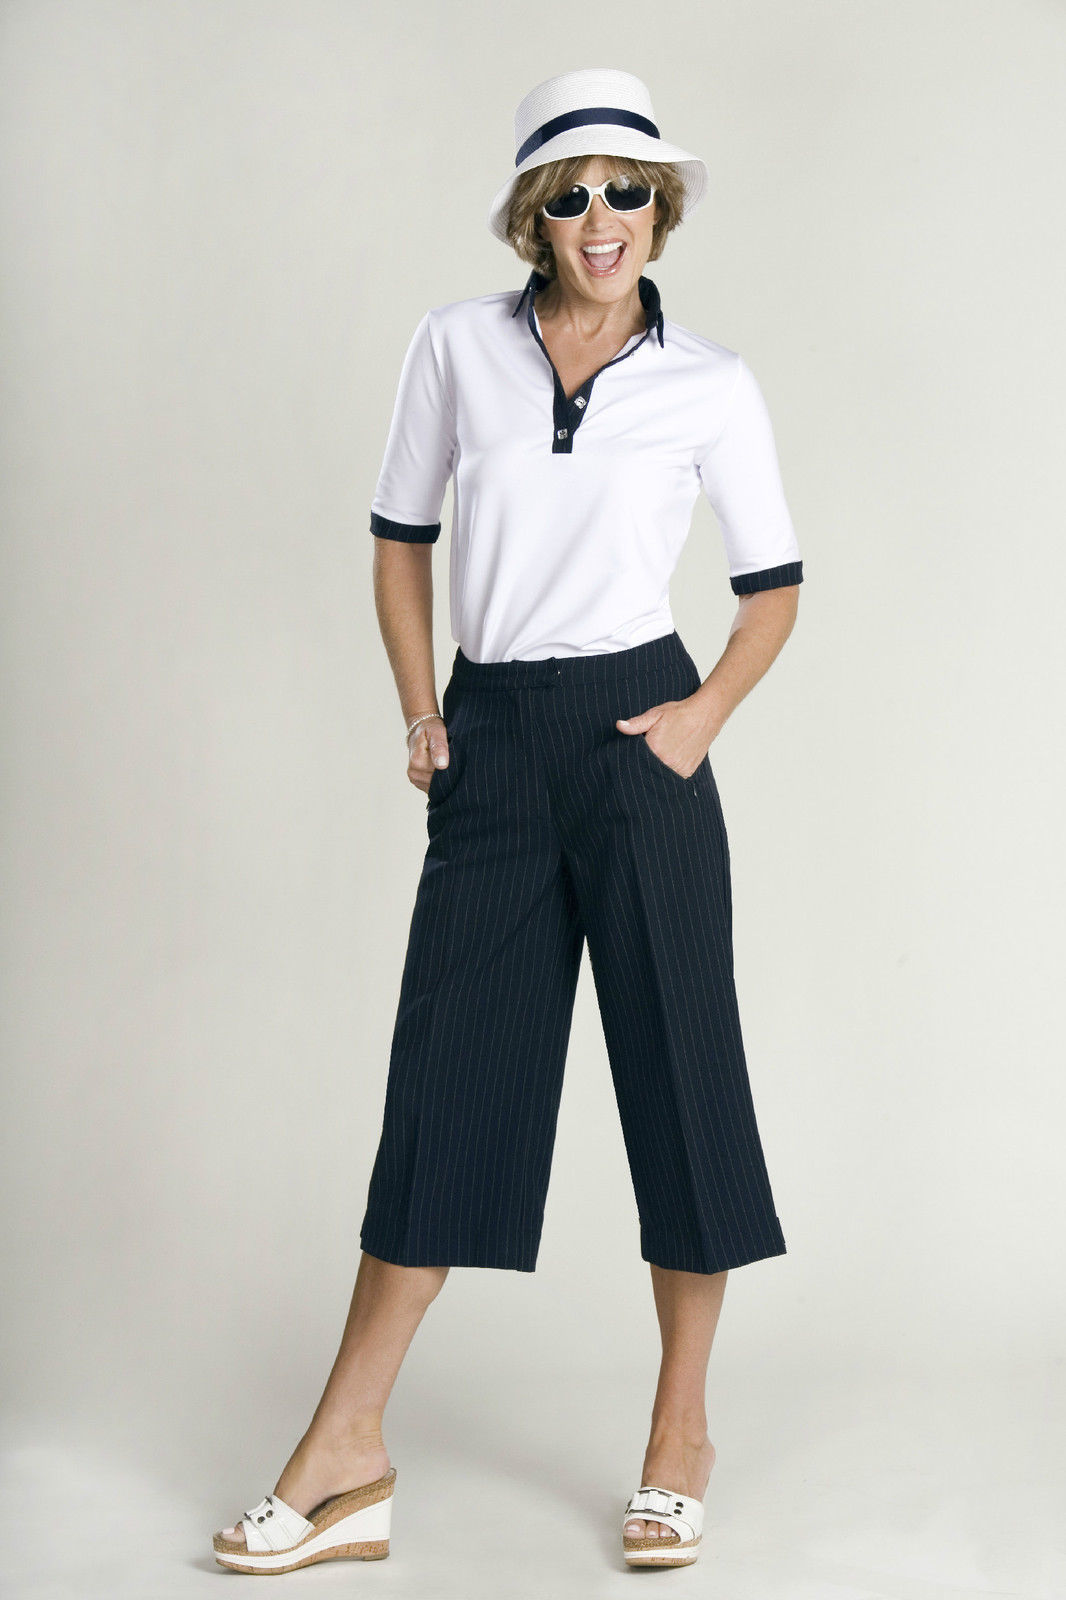 Stylish Golf & Casual Flat Panel Front Gaucho Pant, Swarovski Accent